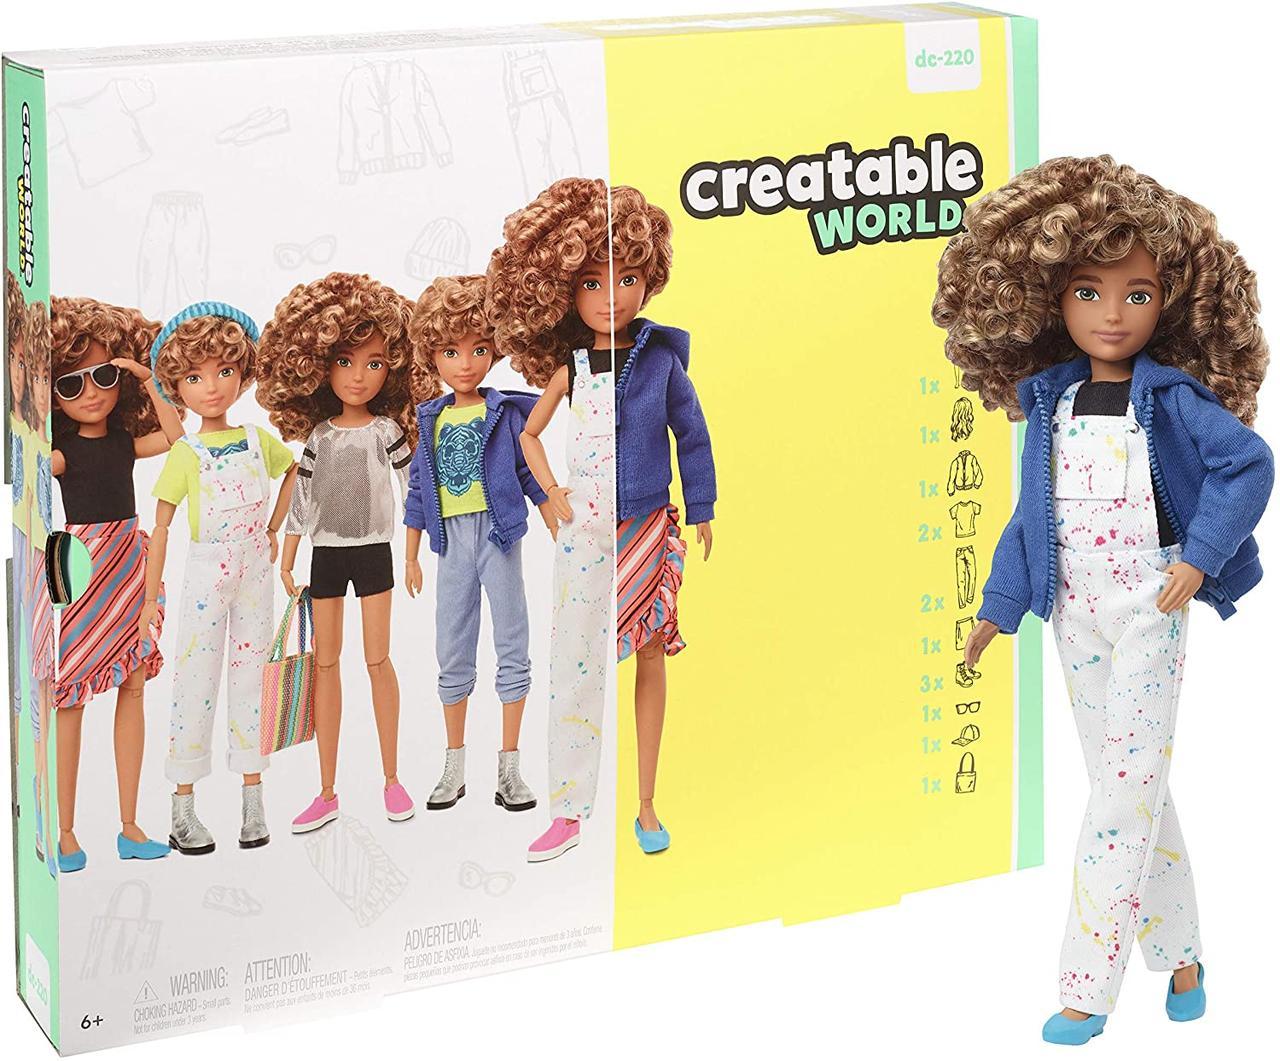 Кукла Создаваемый мир Светлые кучерявые волосы Creatable World Deluxe Character Kit Customizable